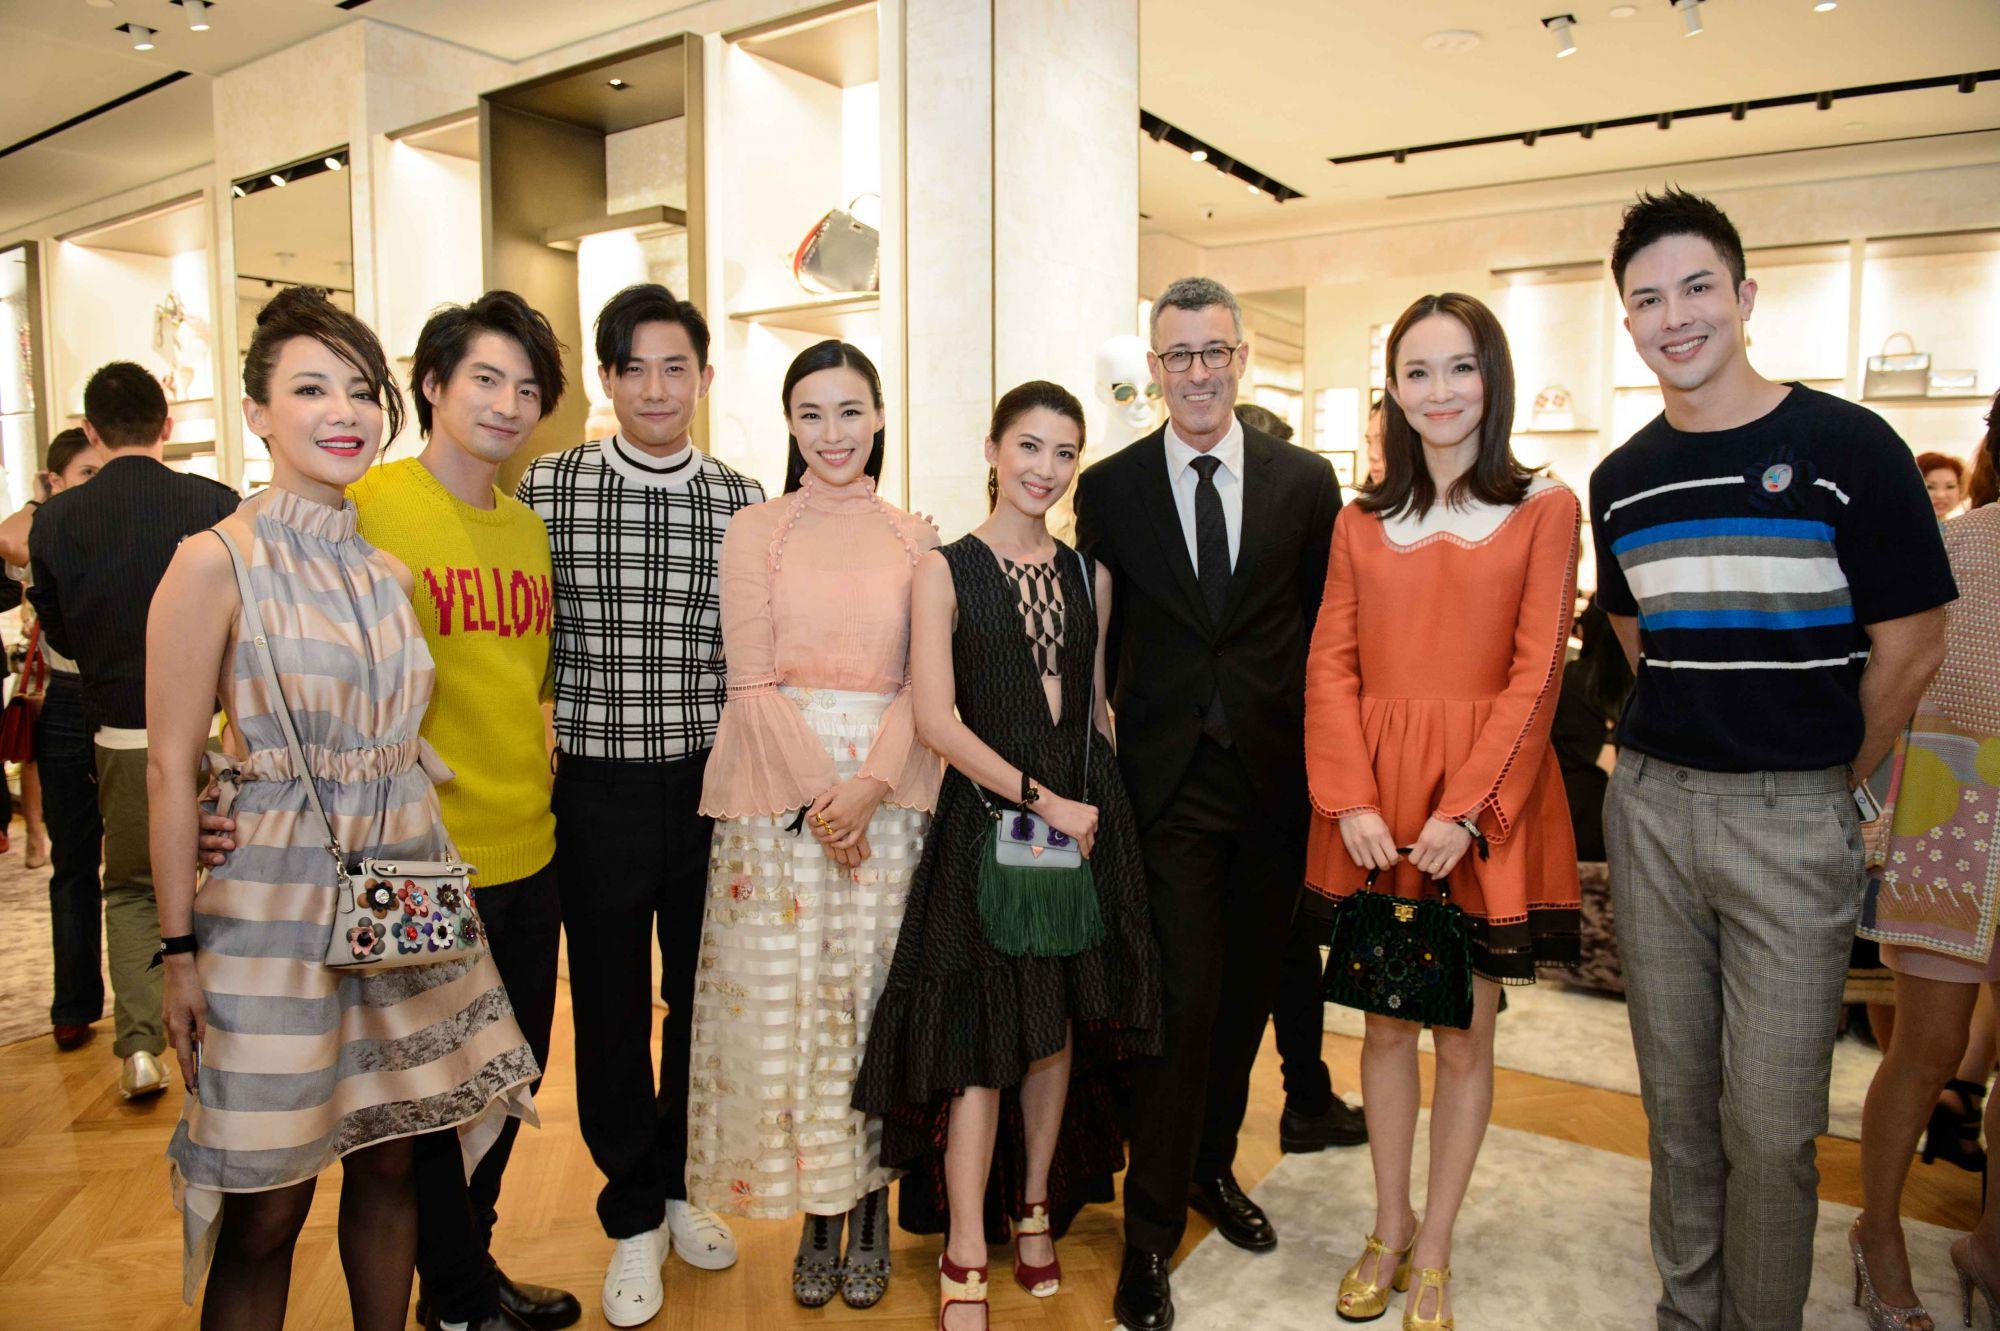 Fiona Xie, Yusuke, Desmond Tan, Rebecca Lim, Jeanette Aw, Andrea Crippa, Fann Wong, Teddy Tang